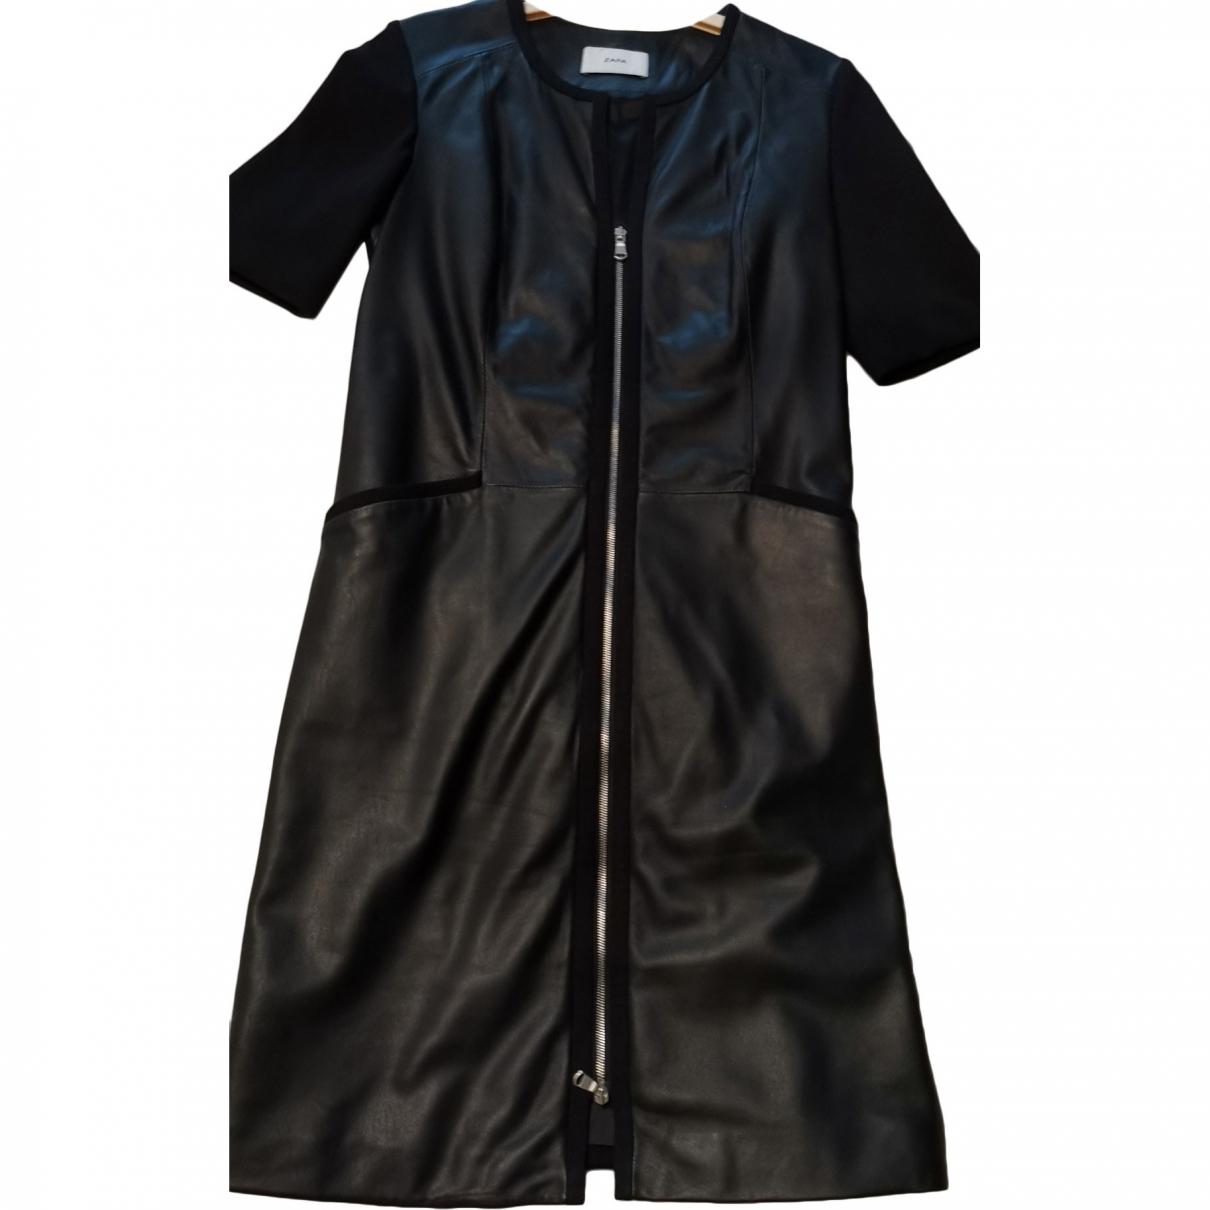 Zapa \N Black Leather dress for Women 36 FR